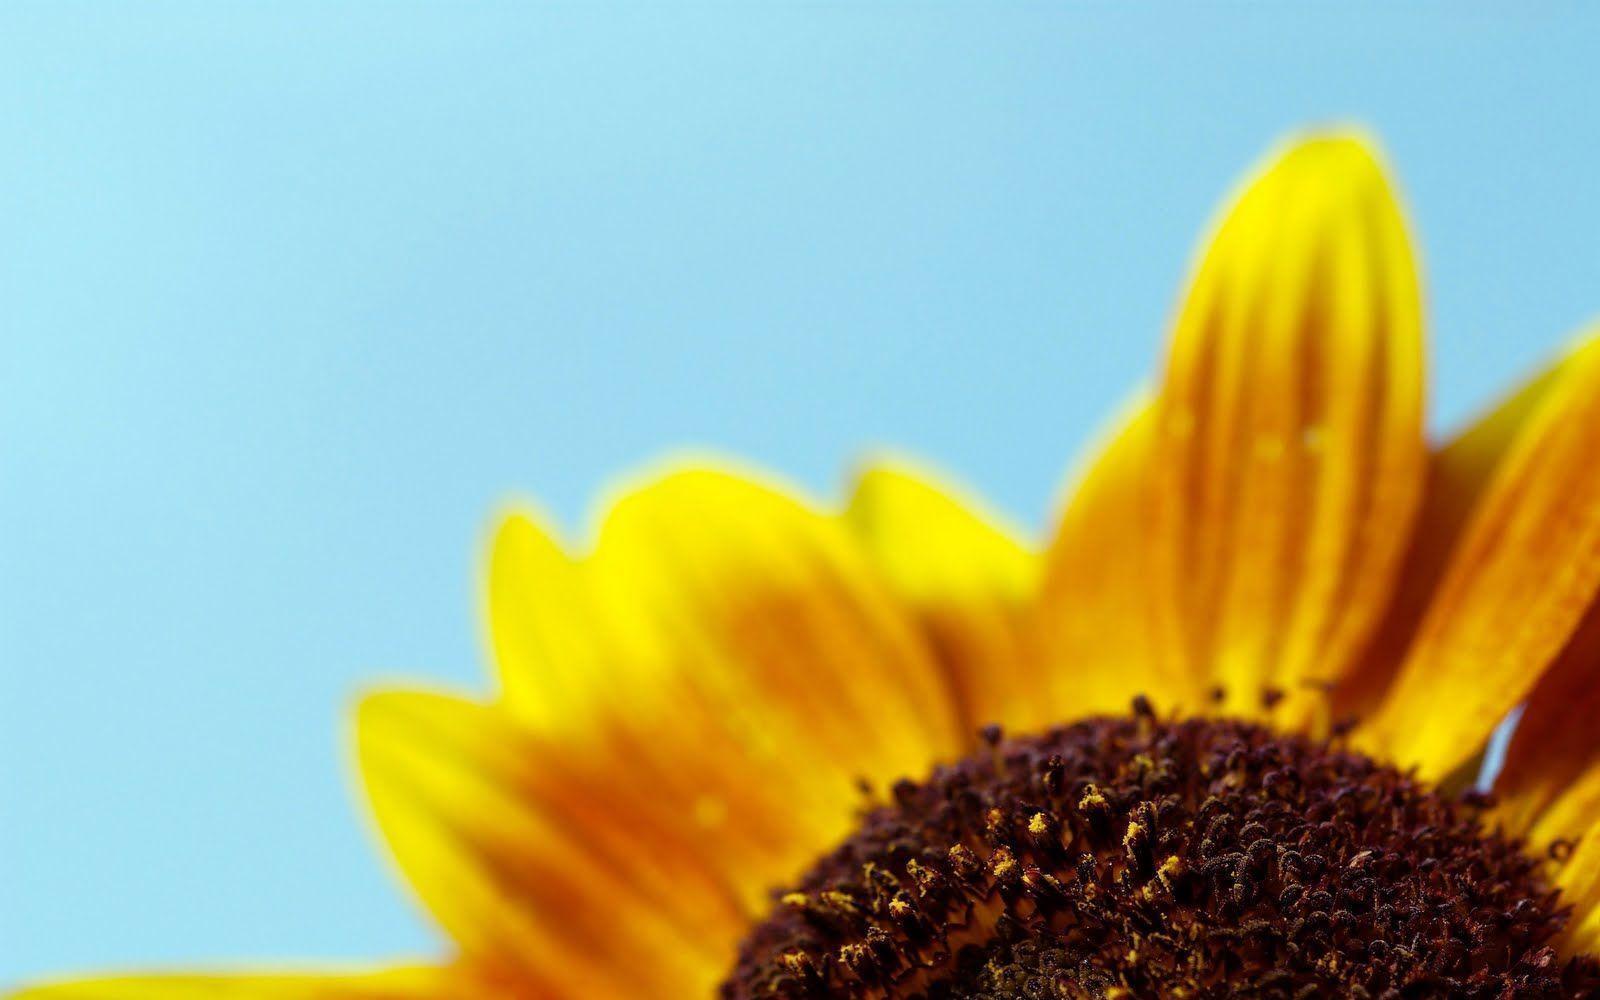 Sunflower Wallpapers Desktop